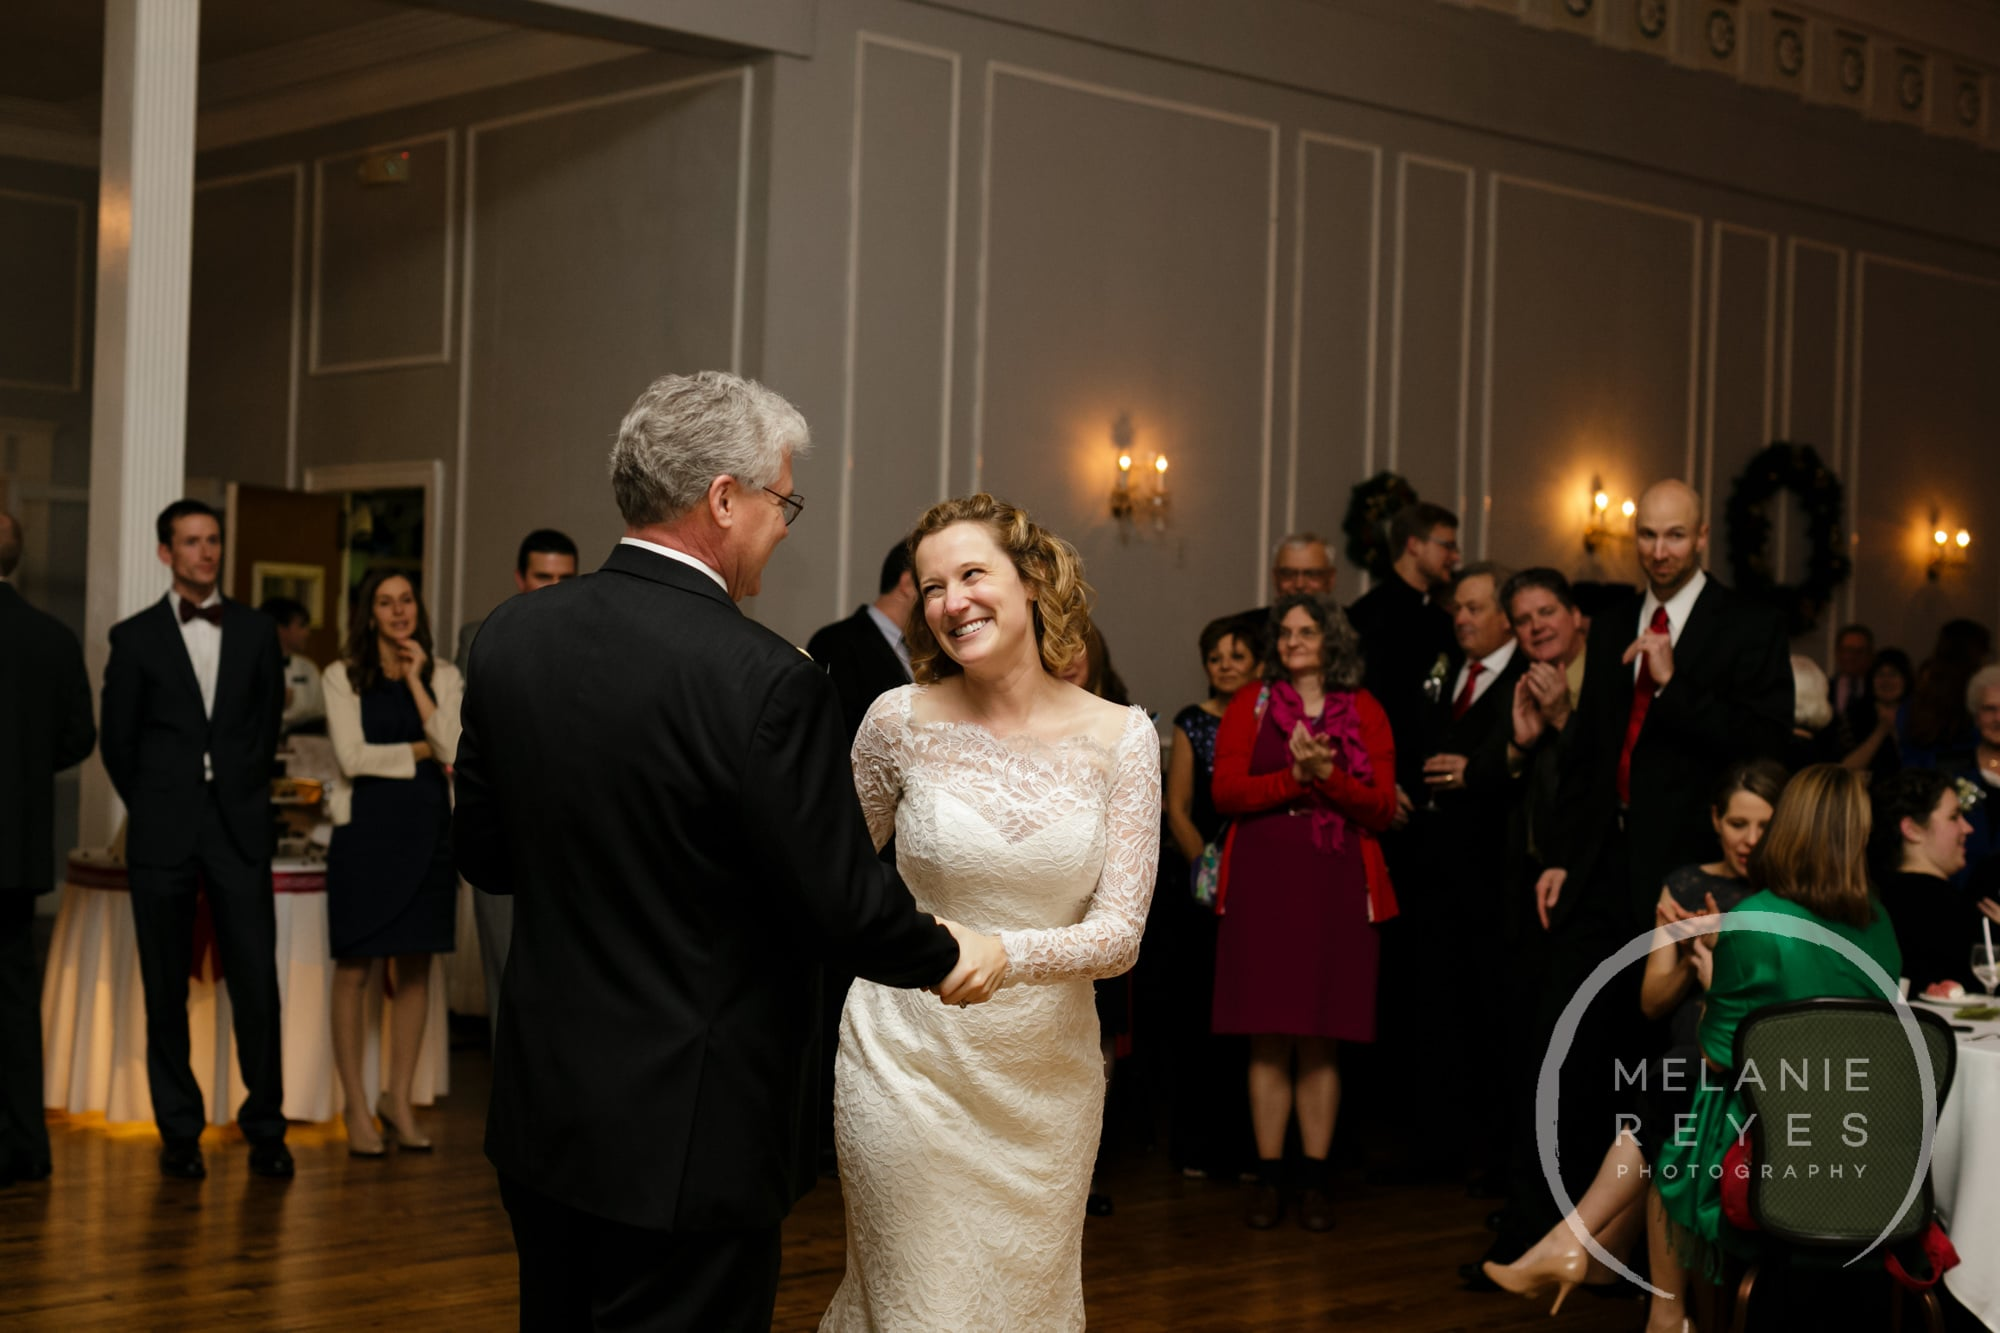 2015_ann_arbor_wedding_photographer_melaniereyes_059.JPG